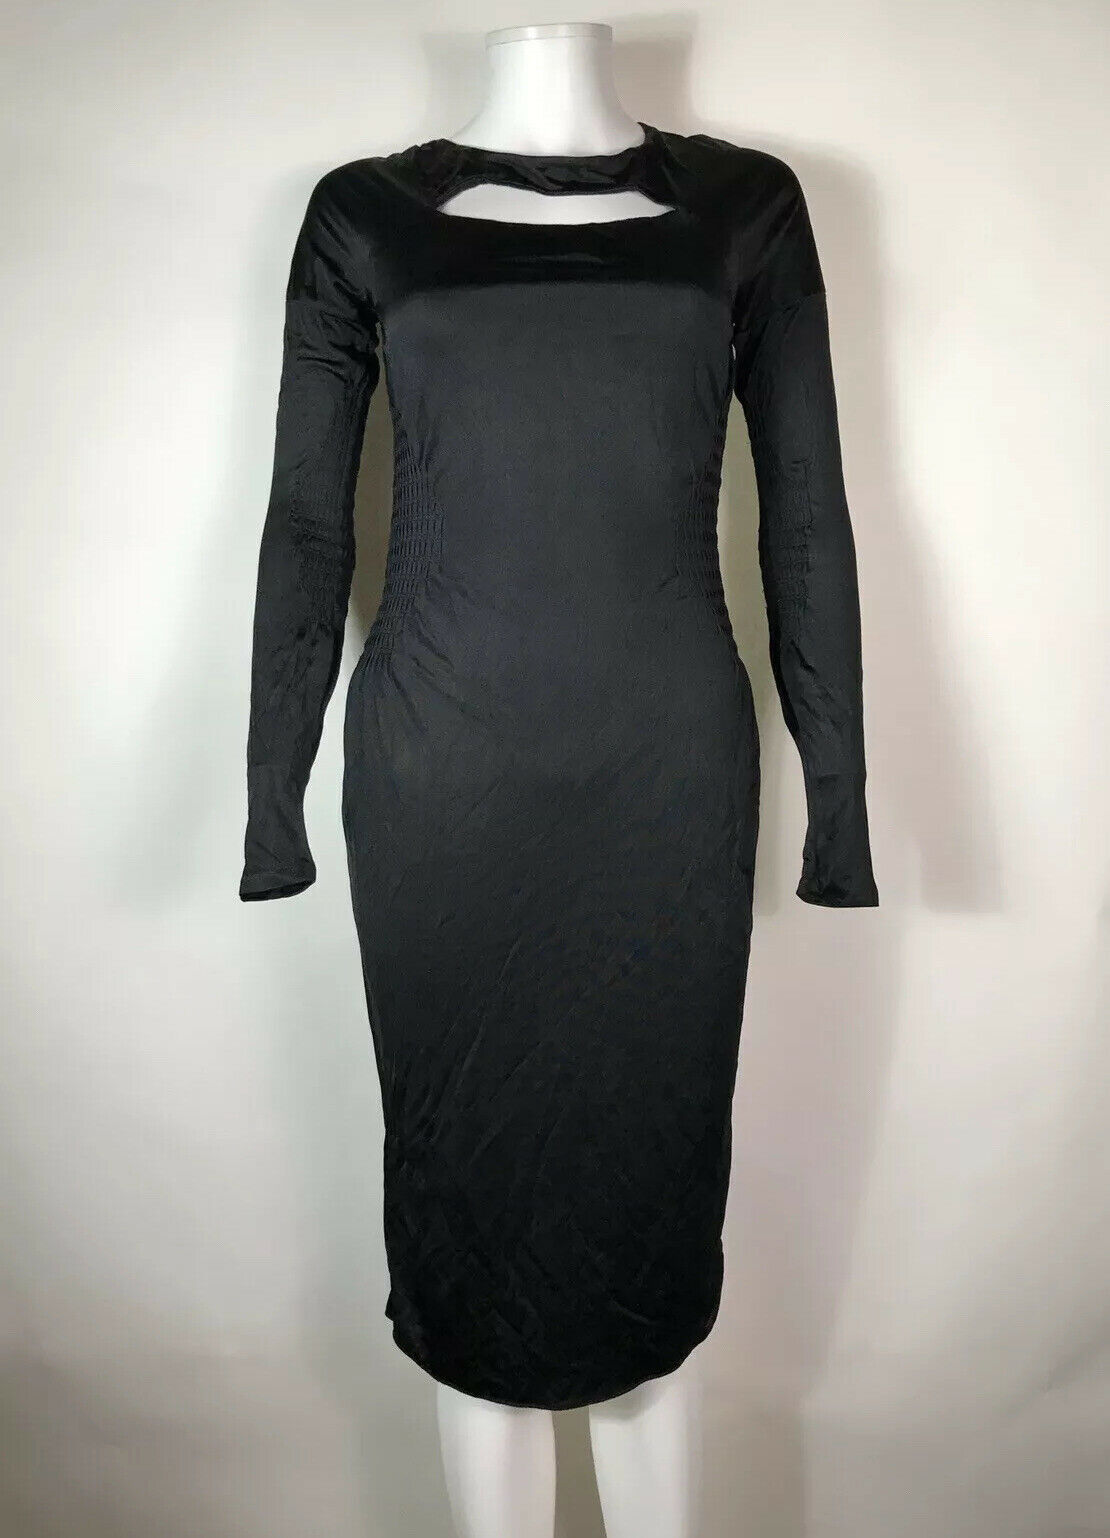 Rare Vtg Gucci Black Cut Out Dress S - image 2